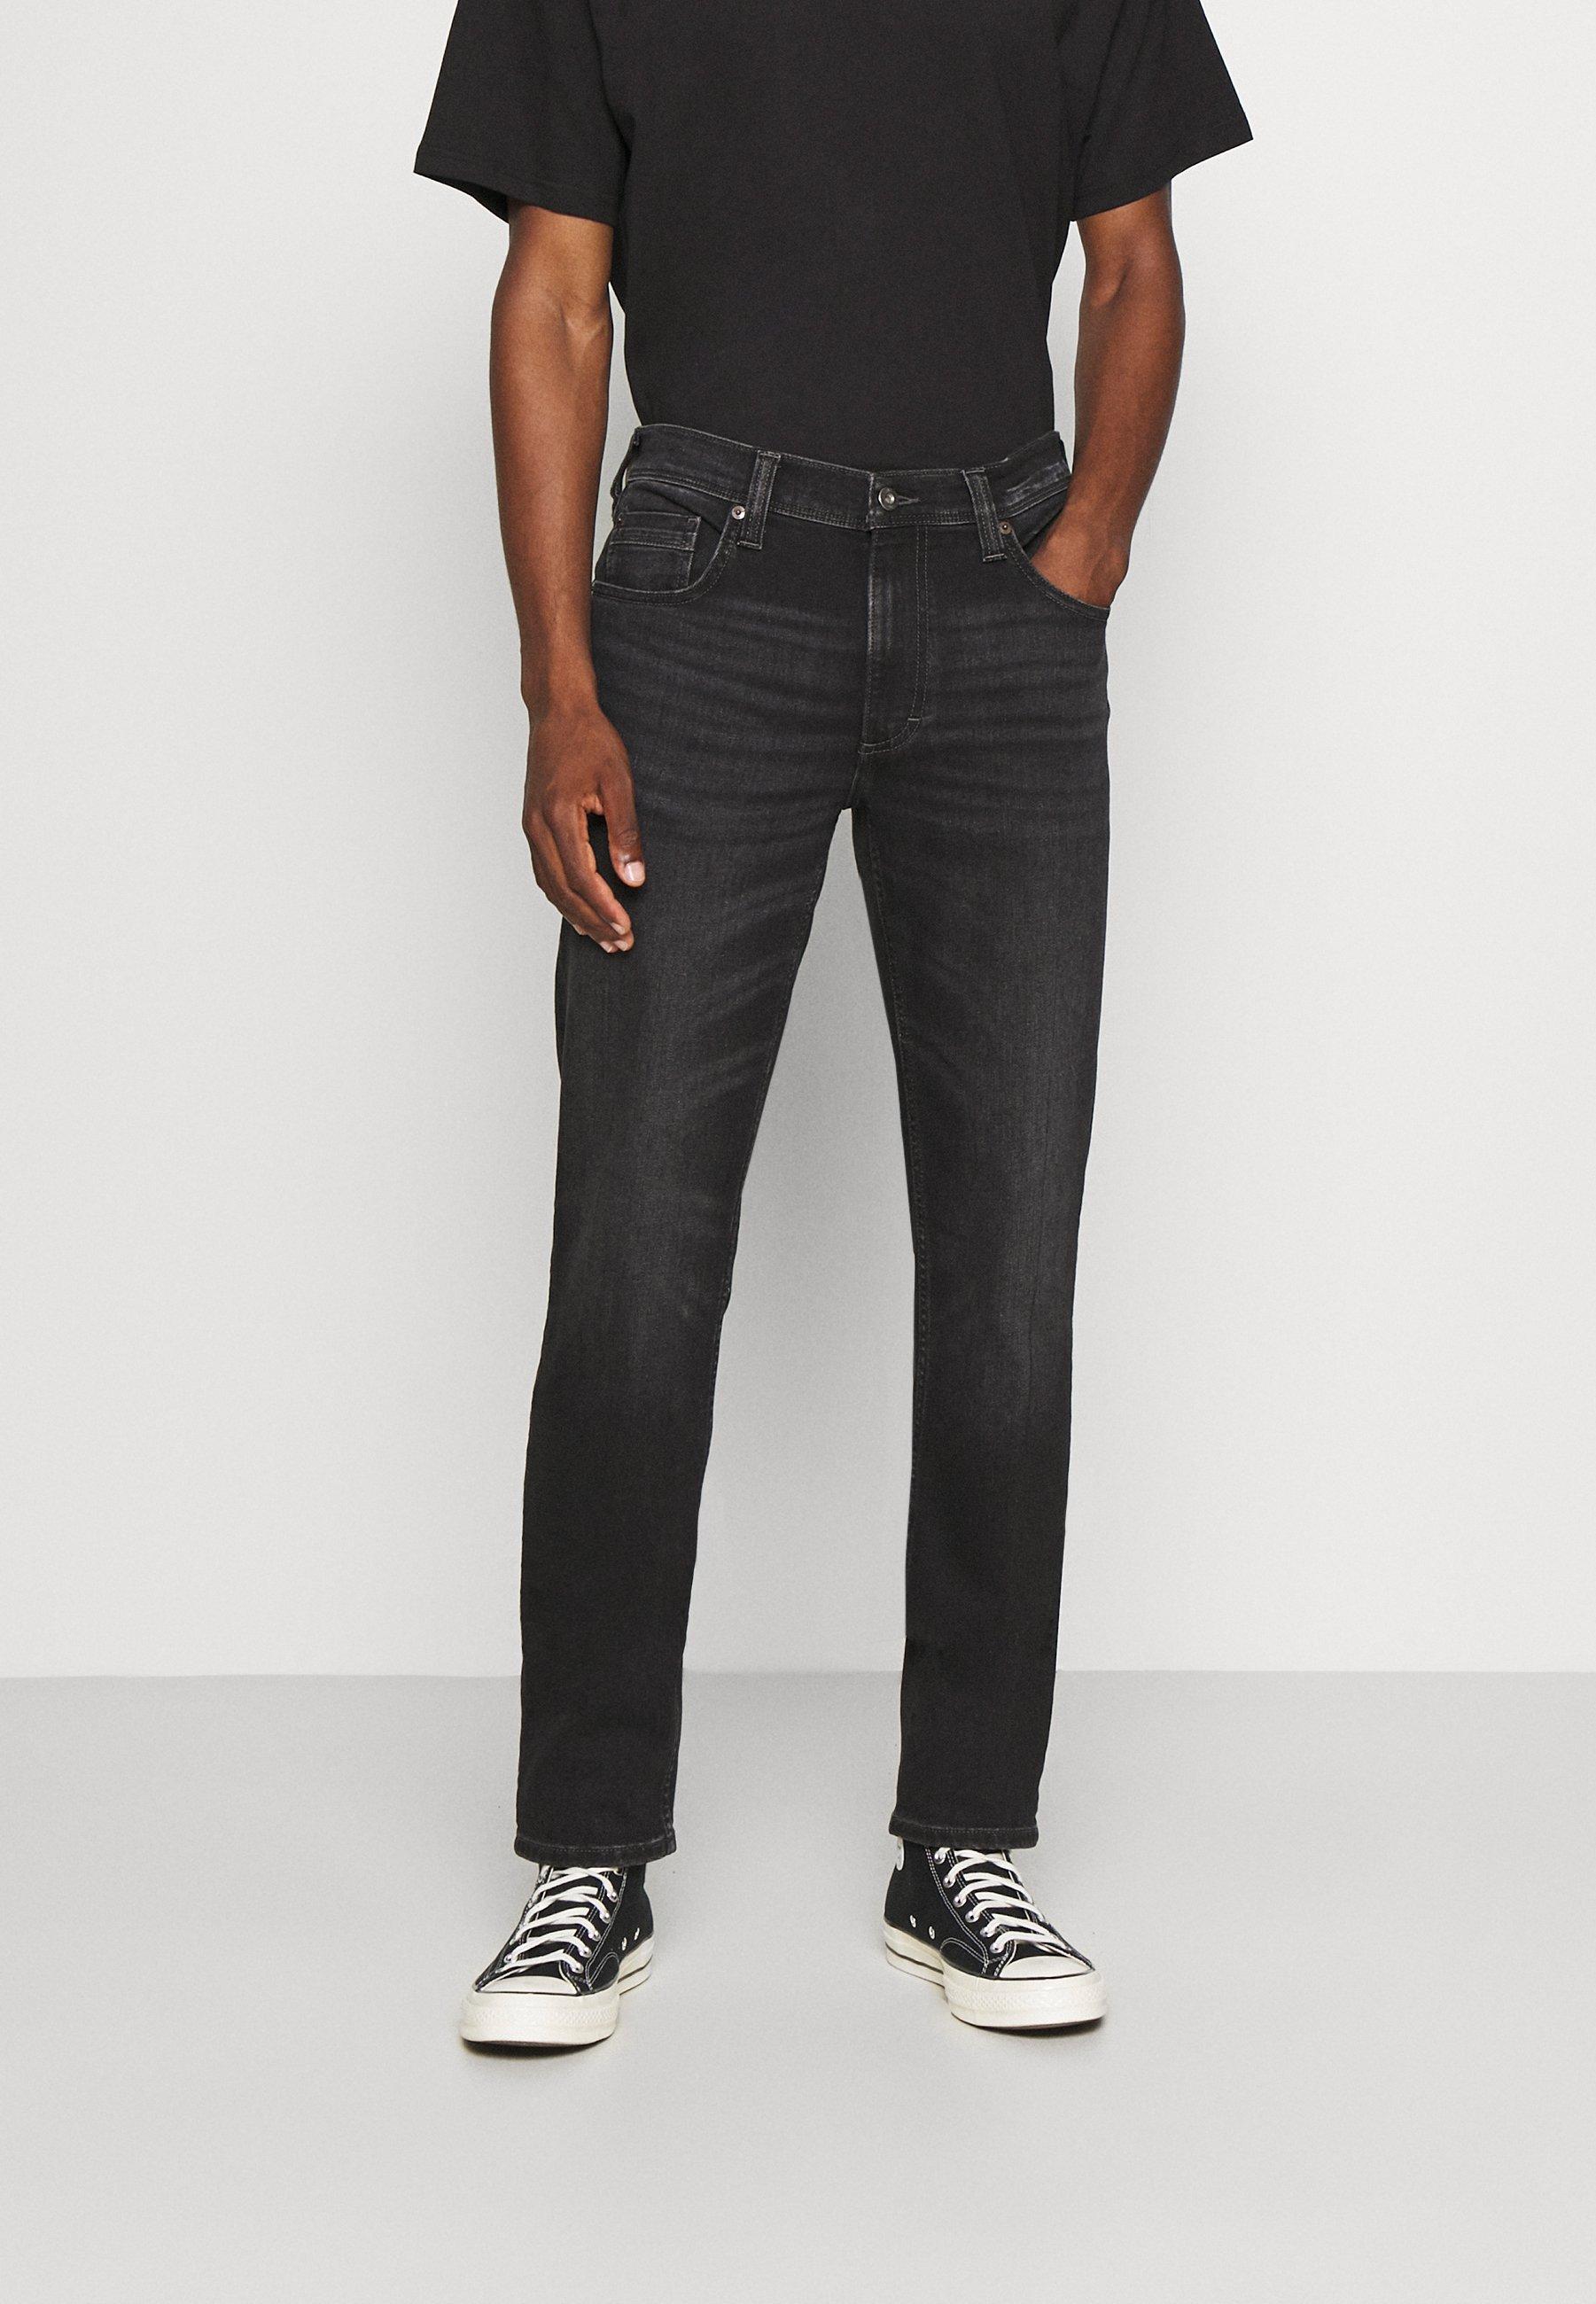 Uomo WASHINGTON JEANS - Jeans a sigaretta